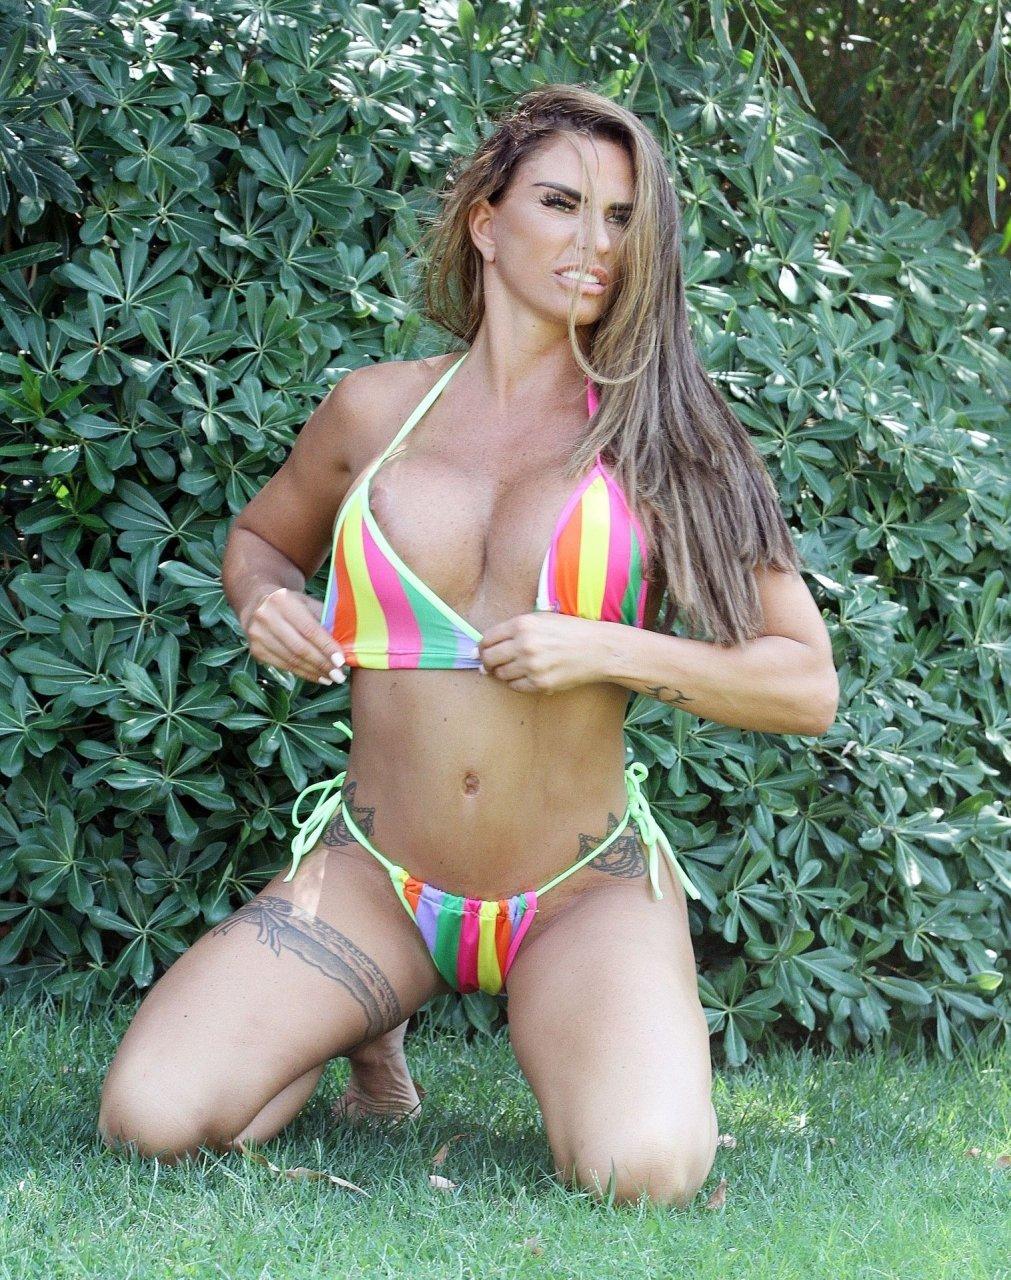 Katie-Price-Nude-Sexy-TheFappeningBlog.com-56.jpg